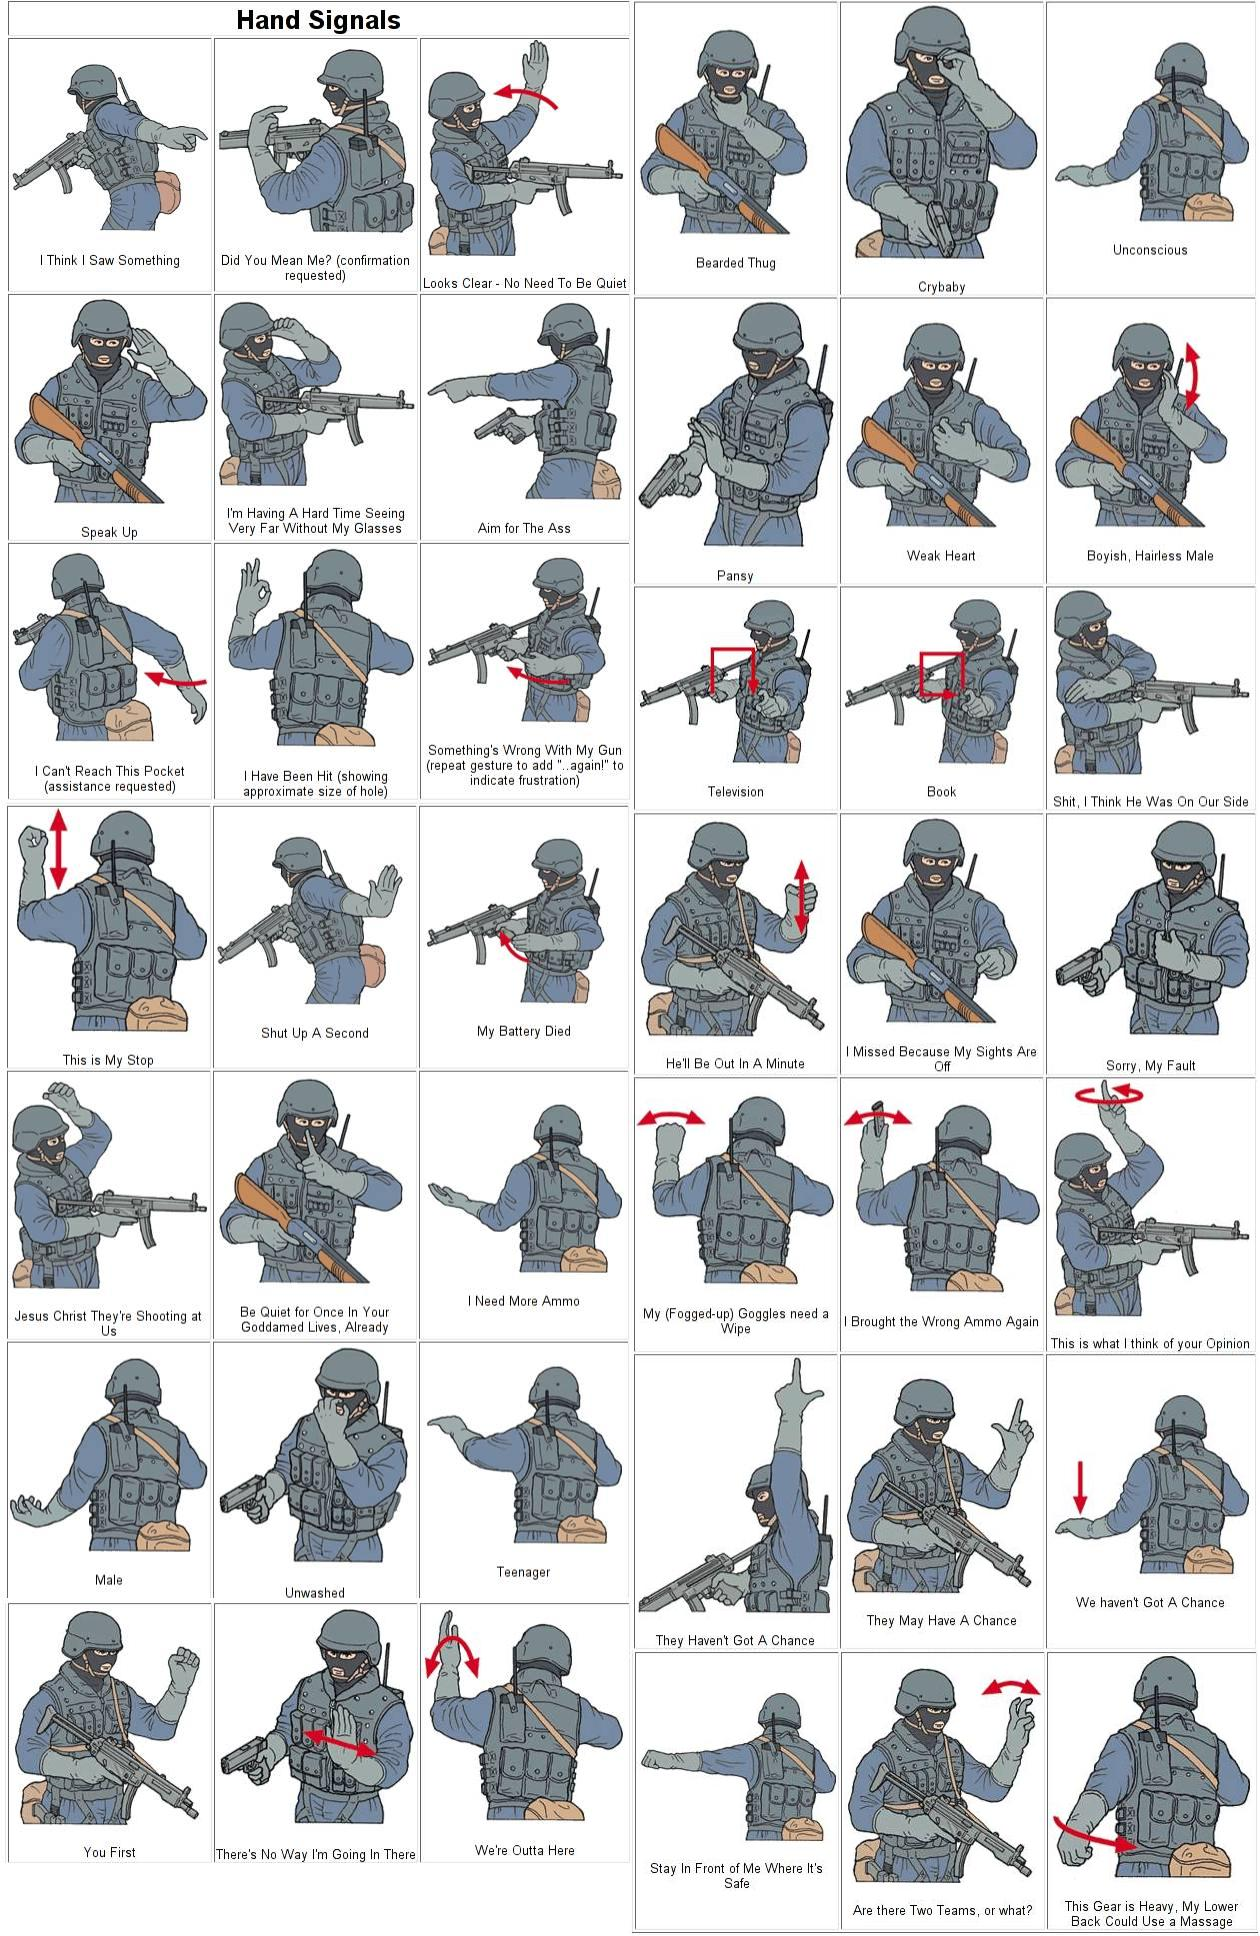 Swat hand signals buycottarizona Choice Image